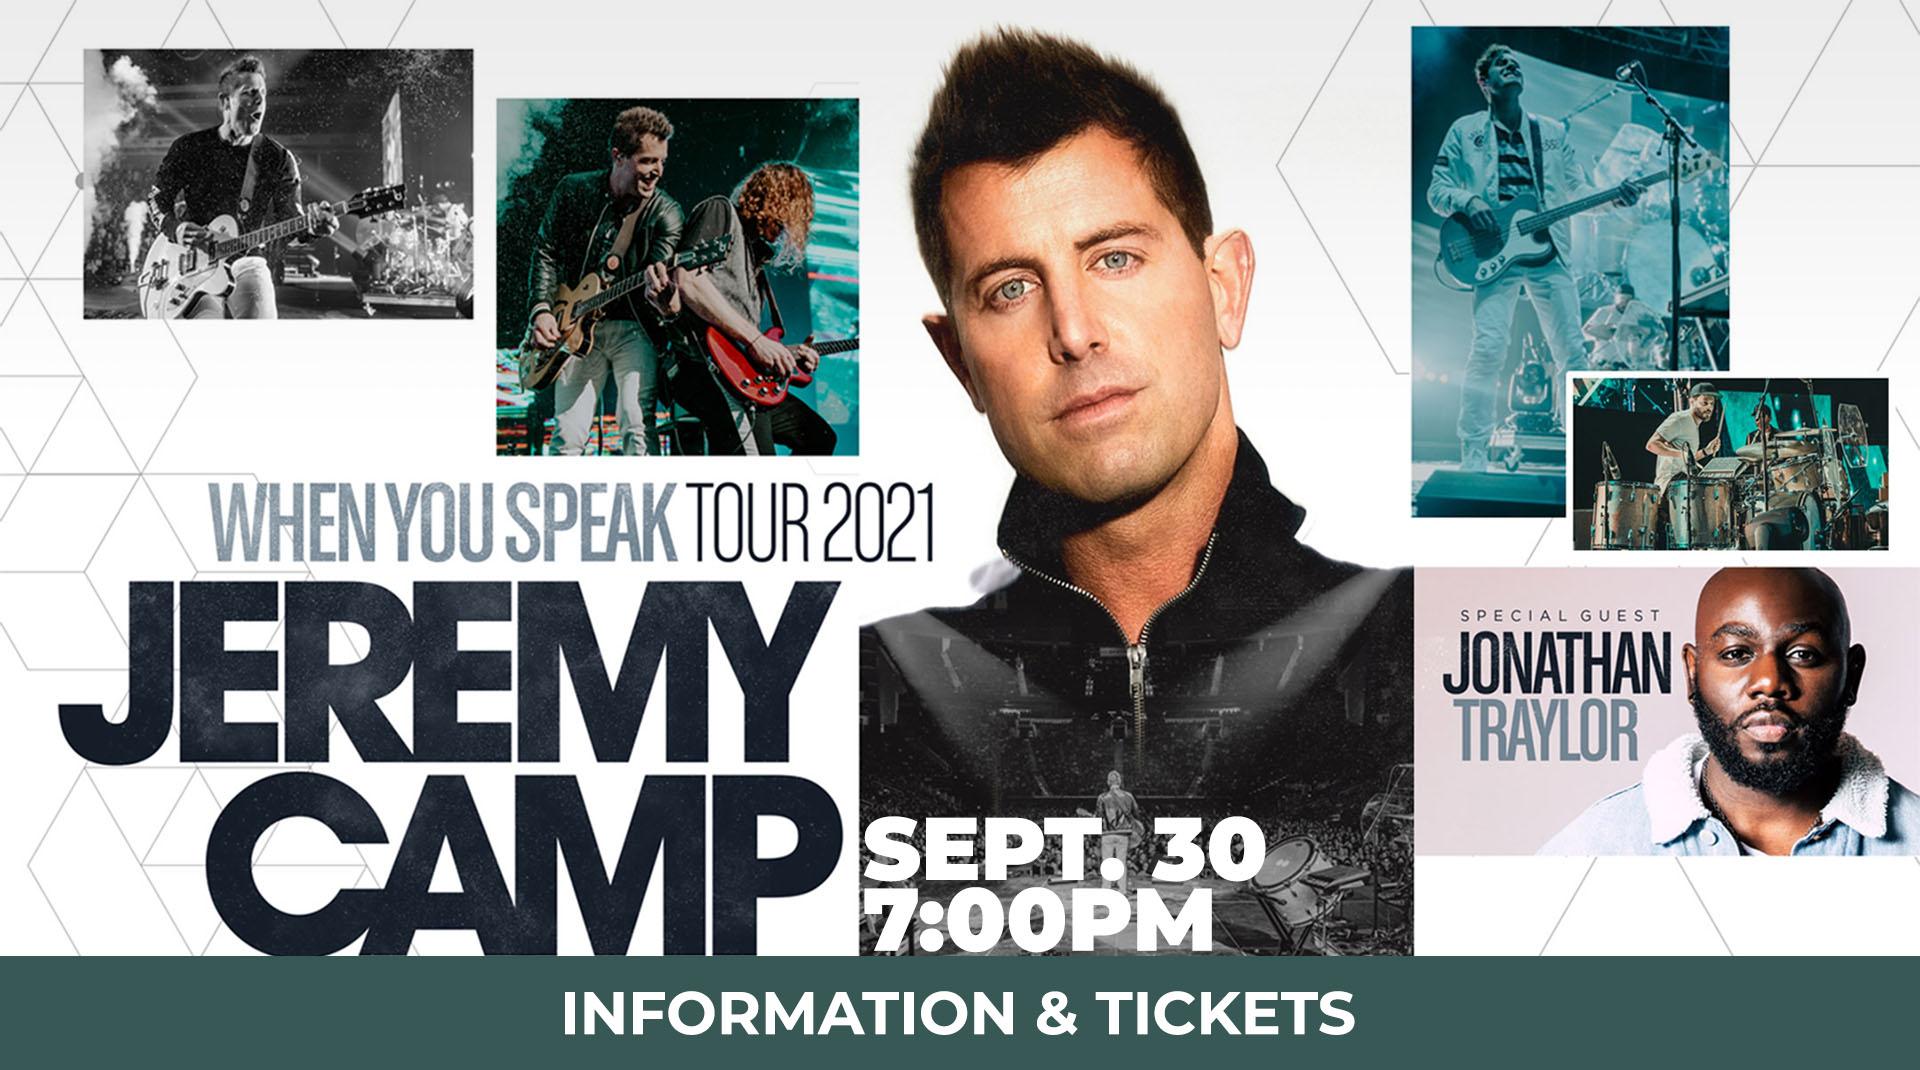 Jeremy Camp You Speak Tour